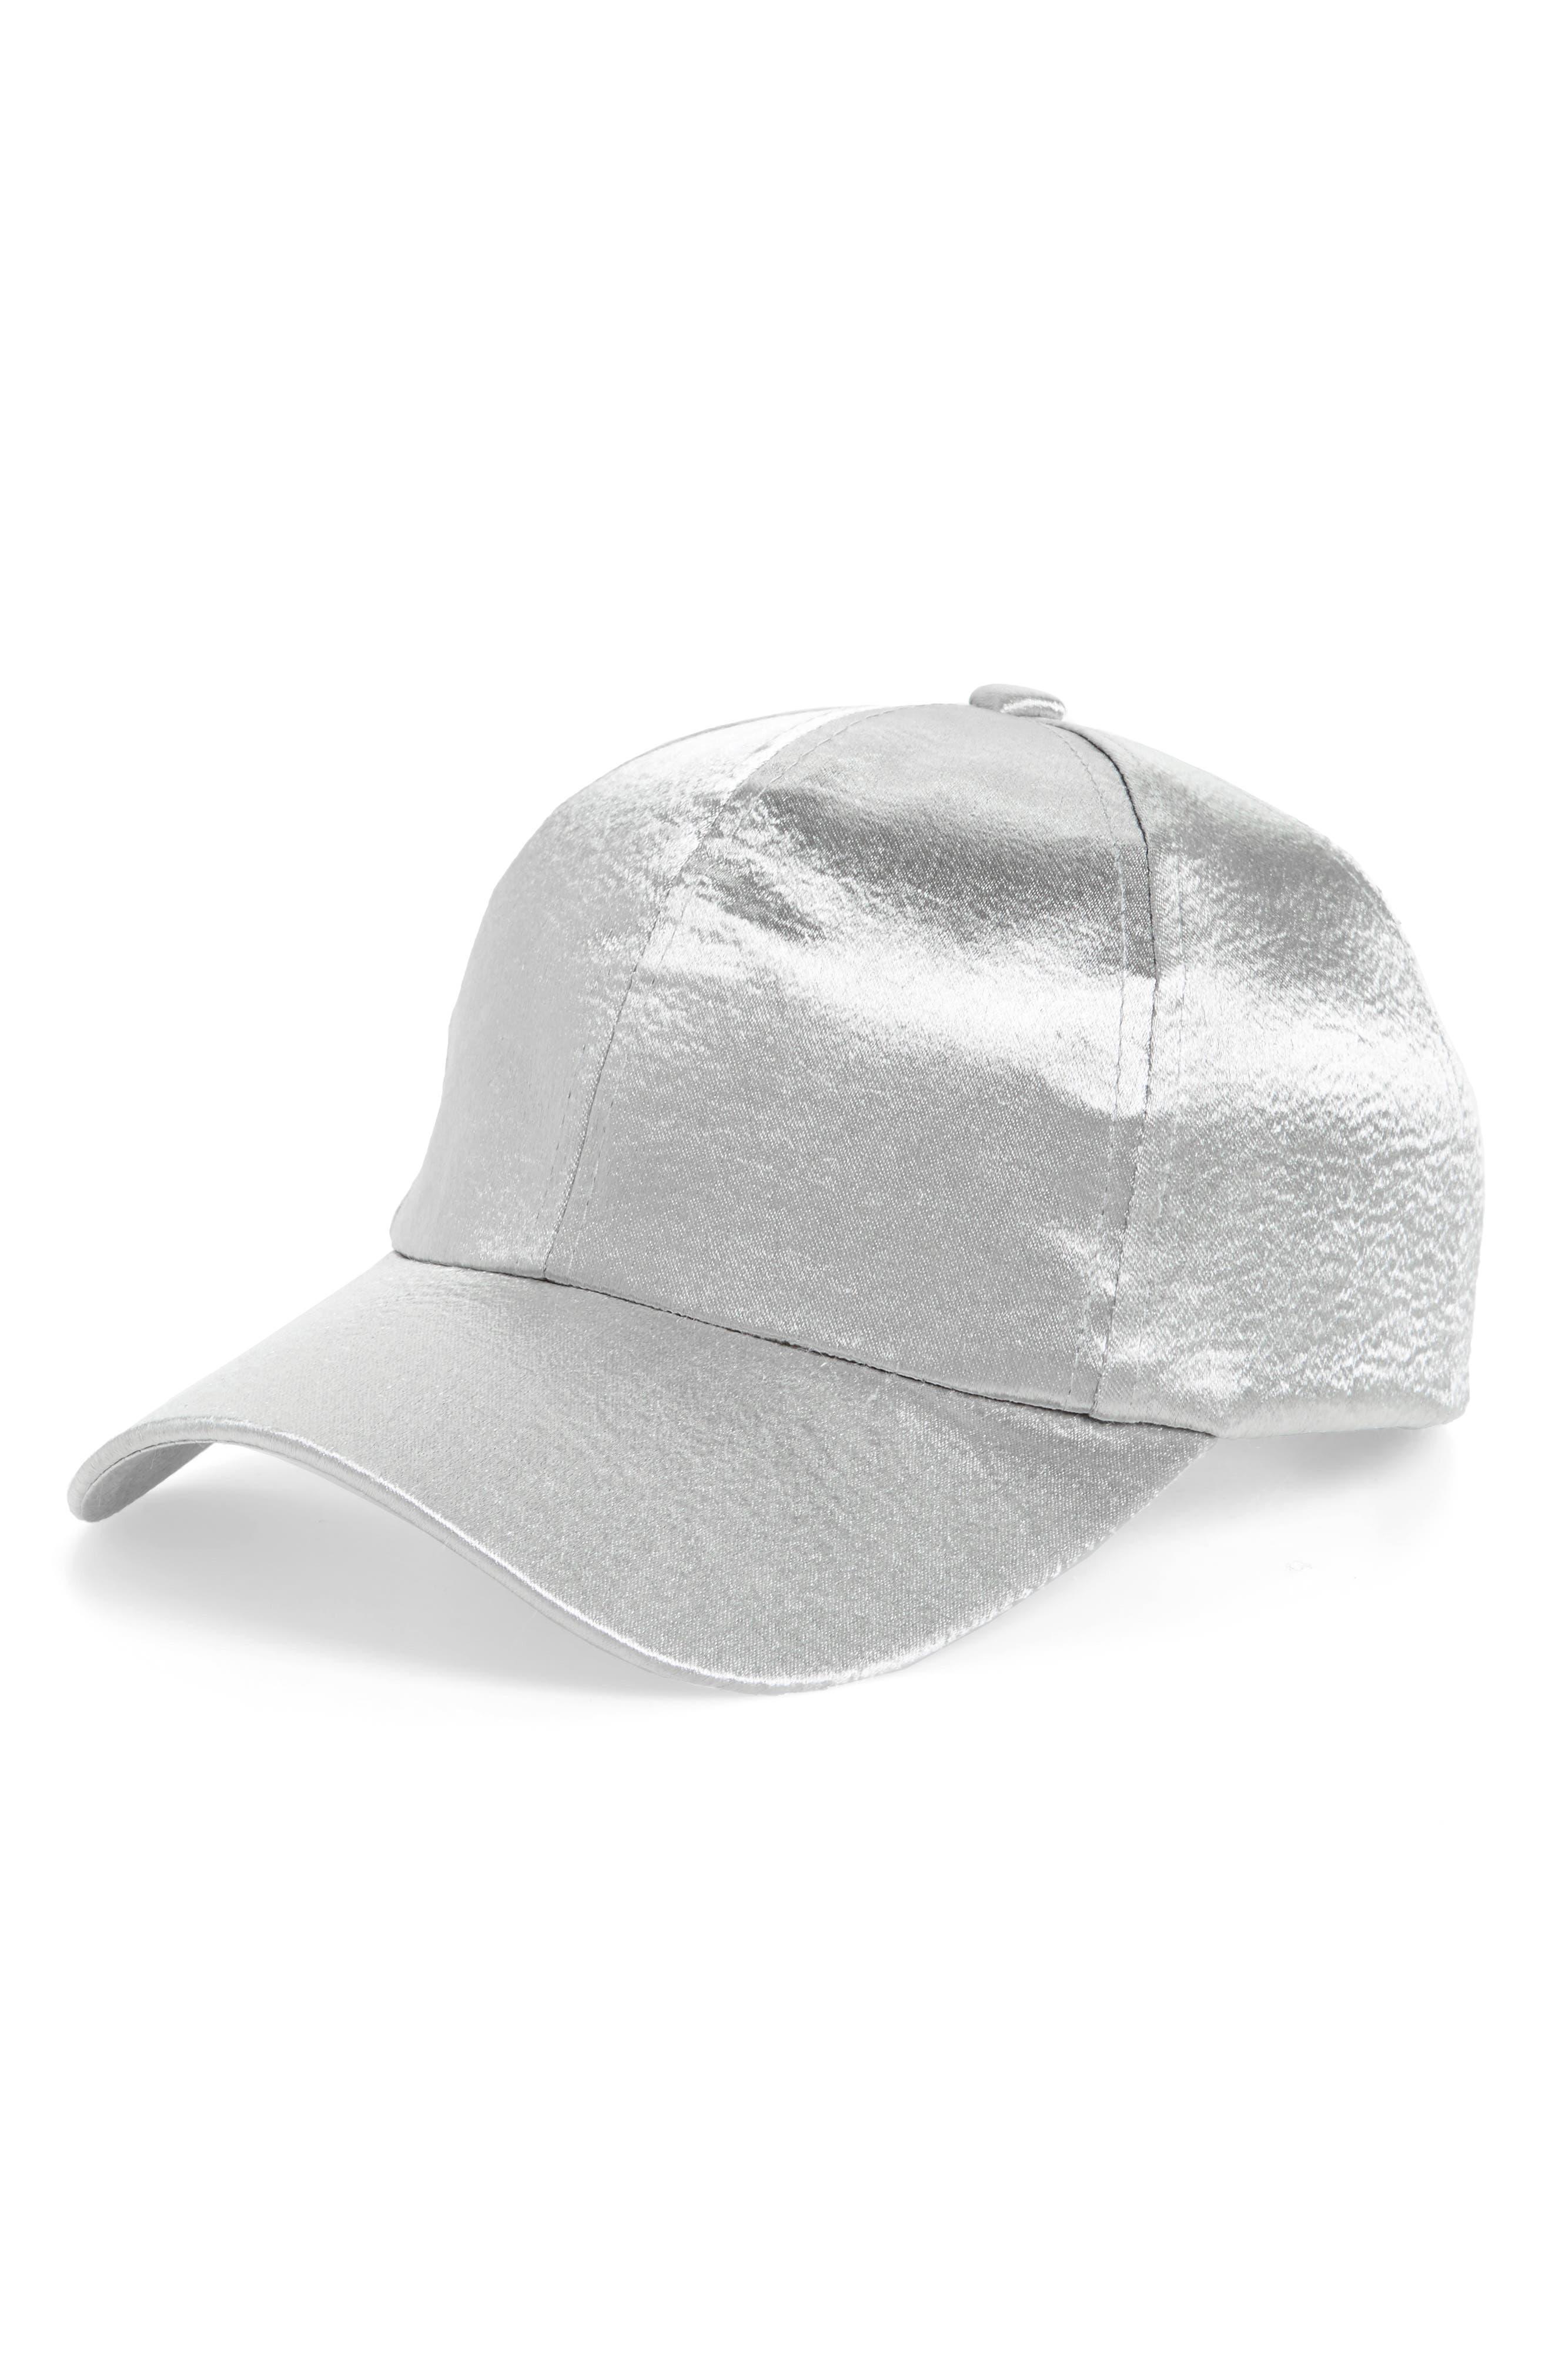 Satin Baseball Cap,                         Main,                         color, 040